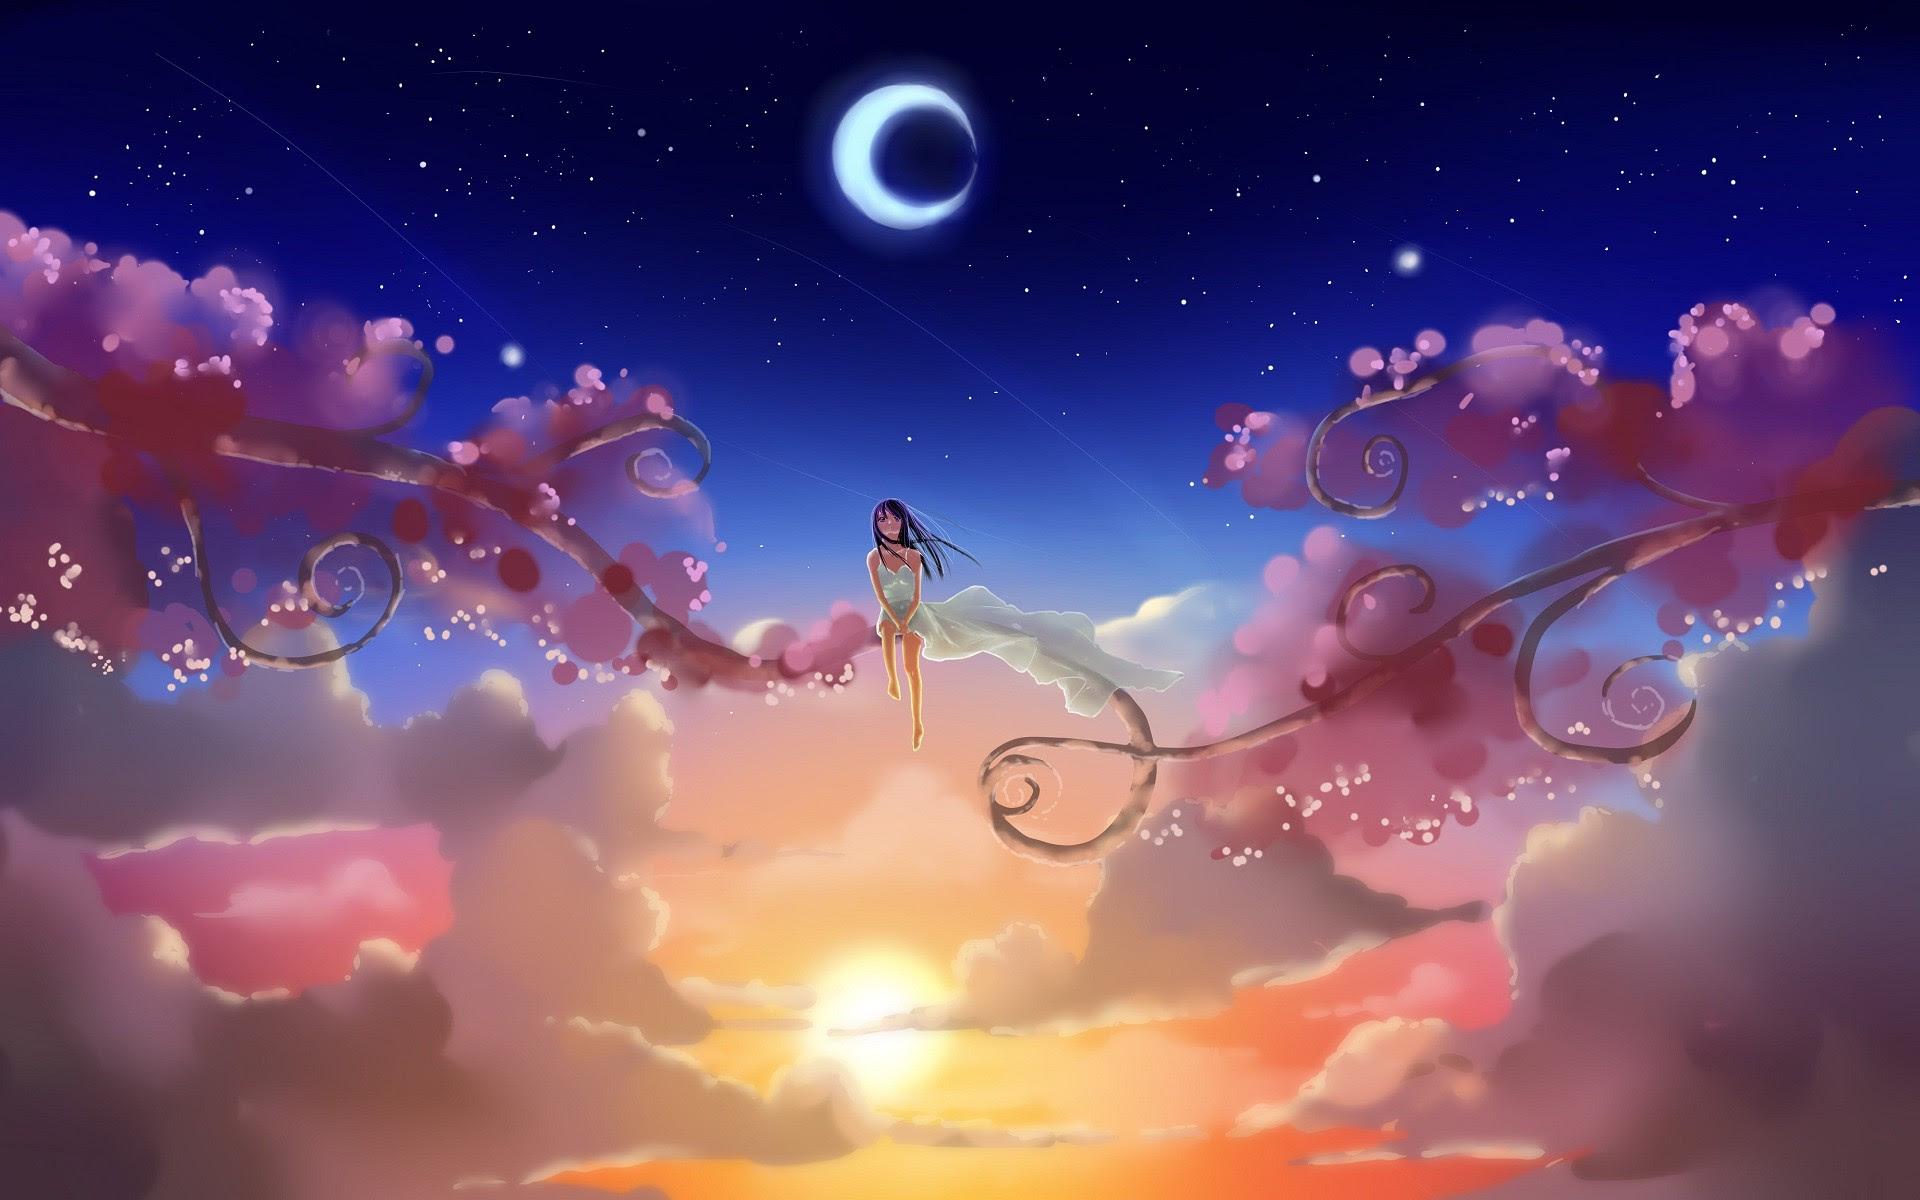 26 Aesthetic Anime Laptop Wallpaper Hd